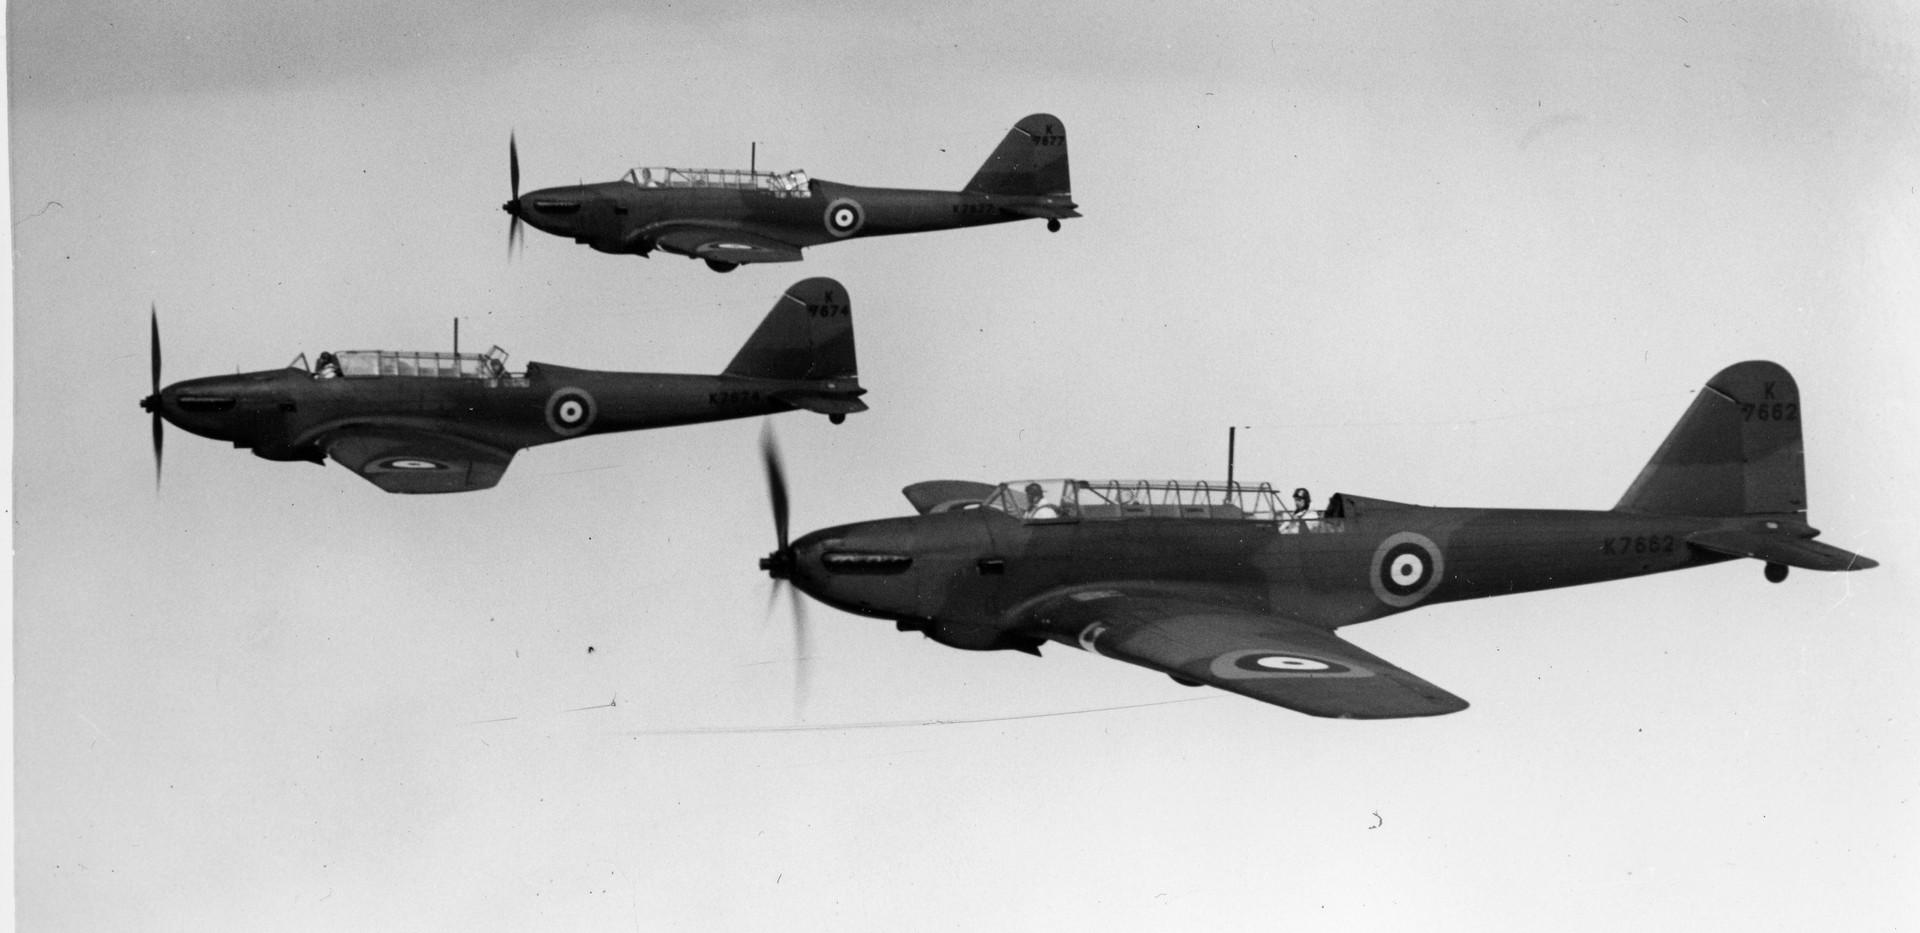 Fairey Battles in formation